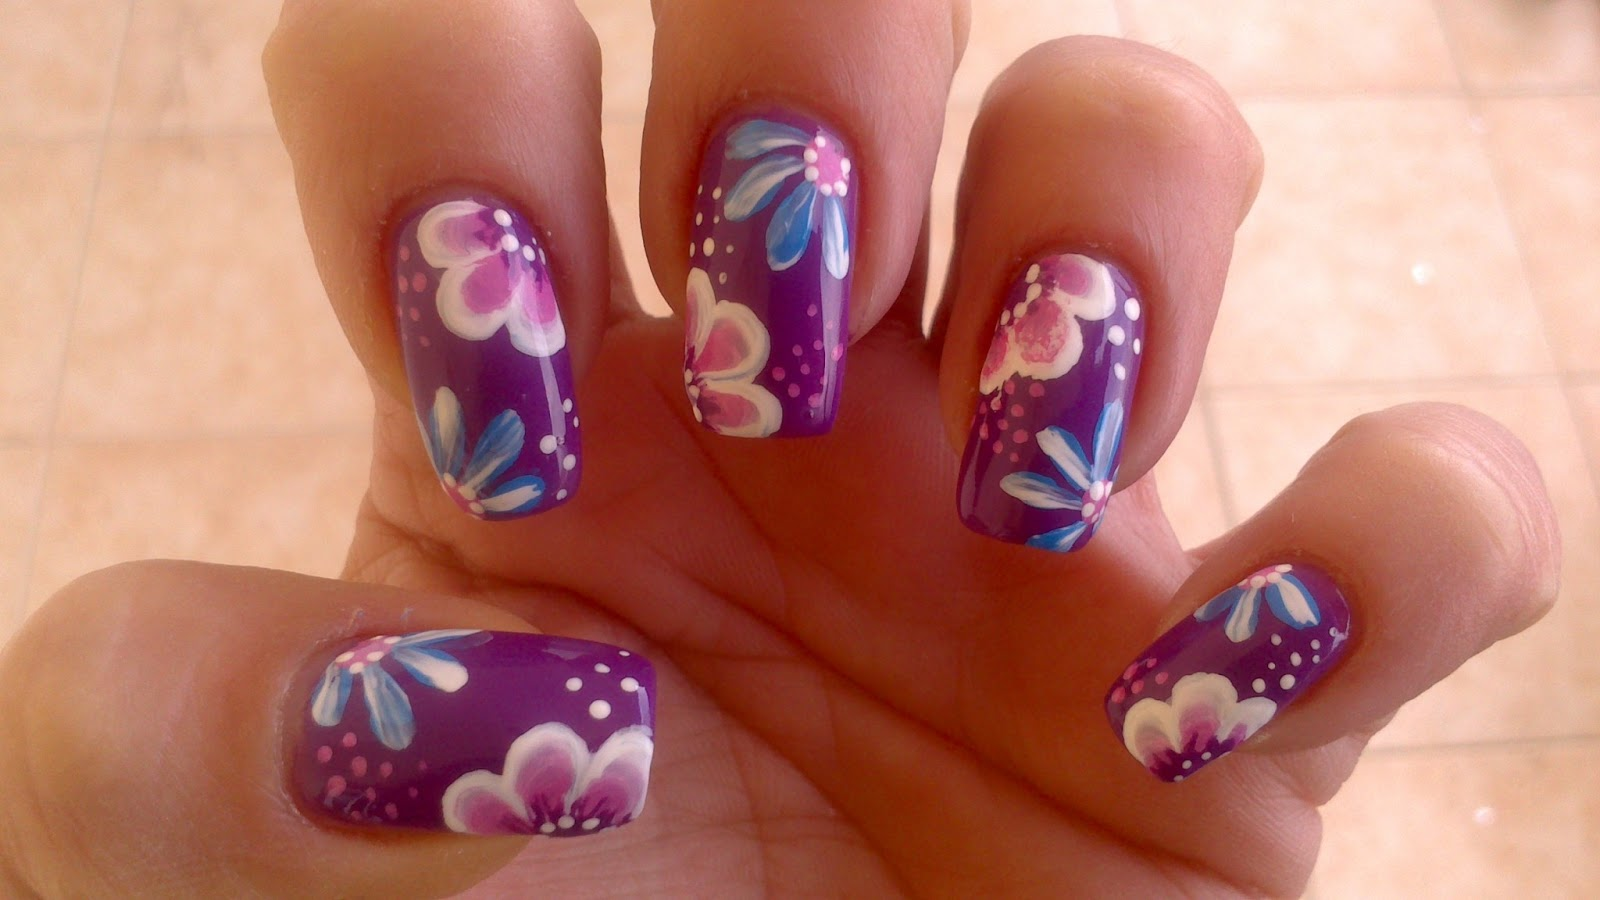 Lnetsa S Nailart One Stroke Spring Flowers